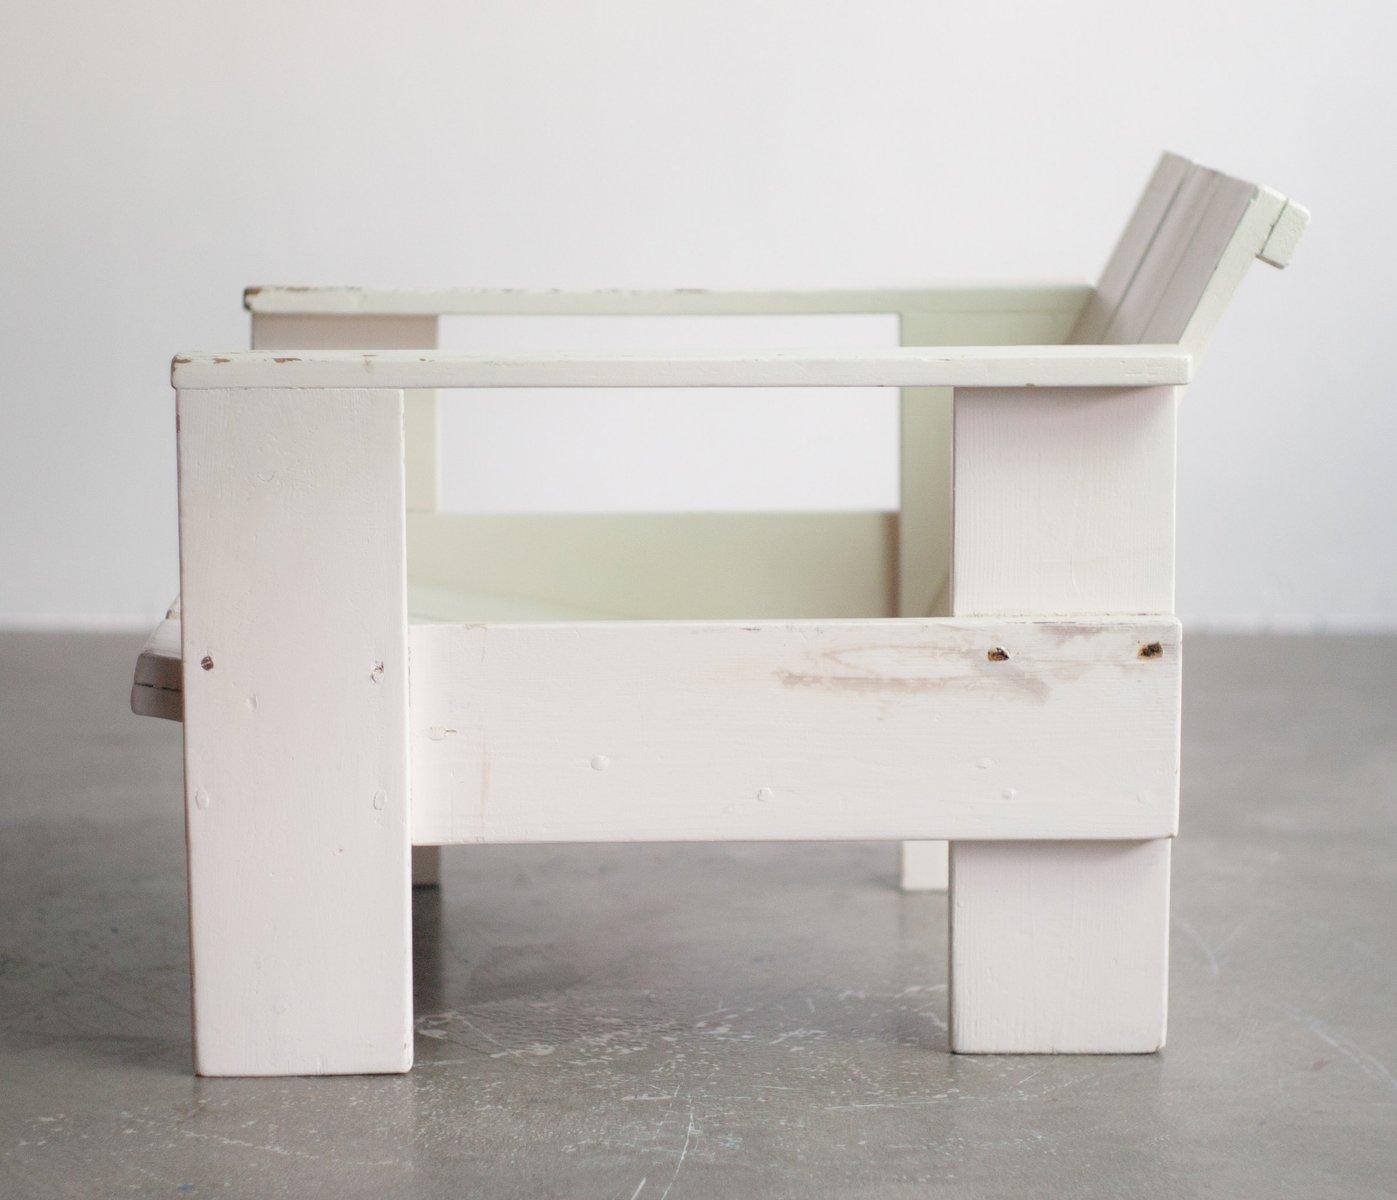 Gerrit rietveld furniture - Price Per Piece